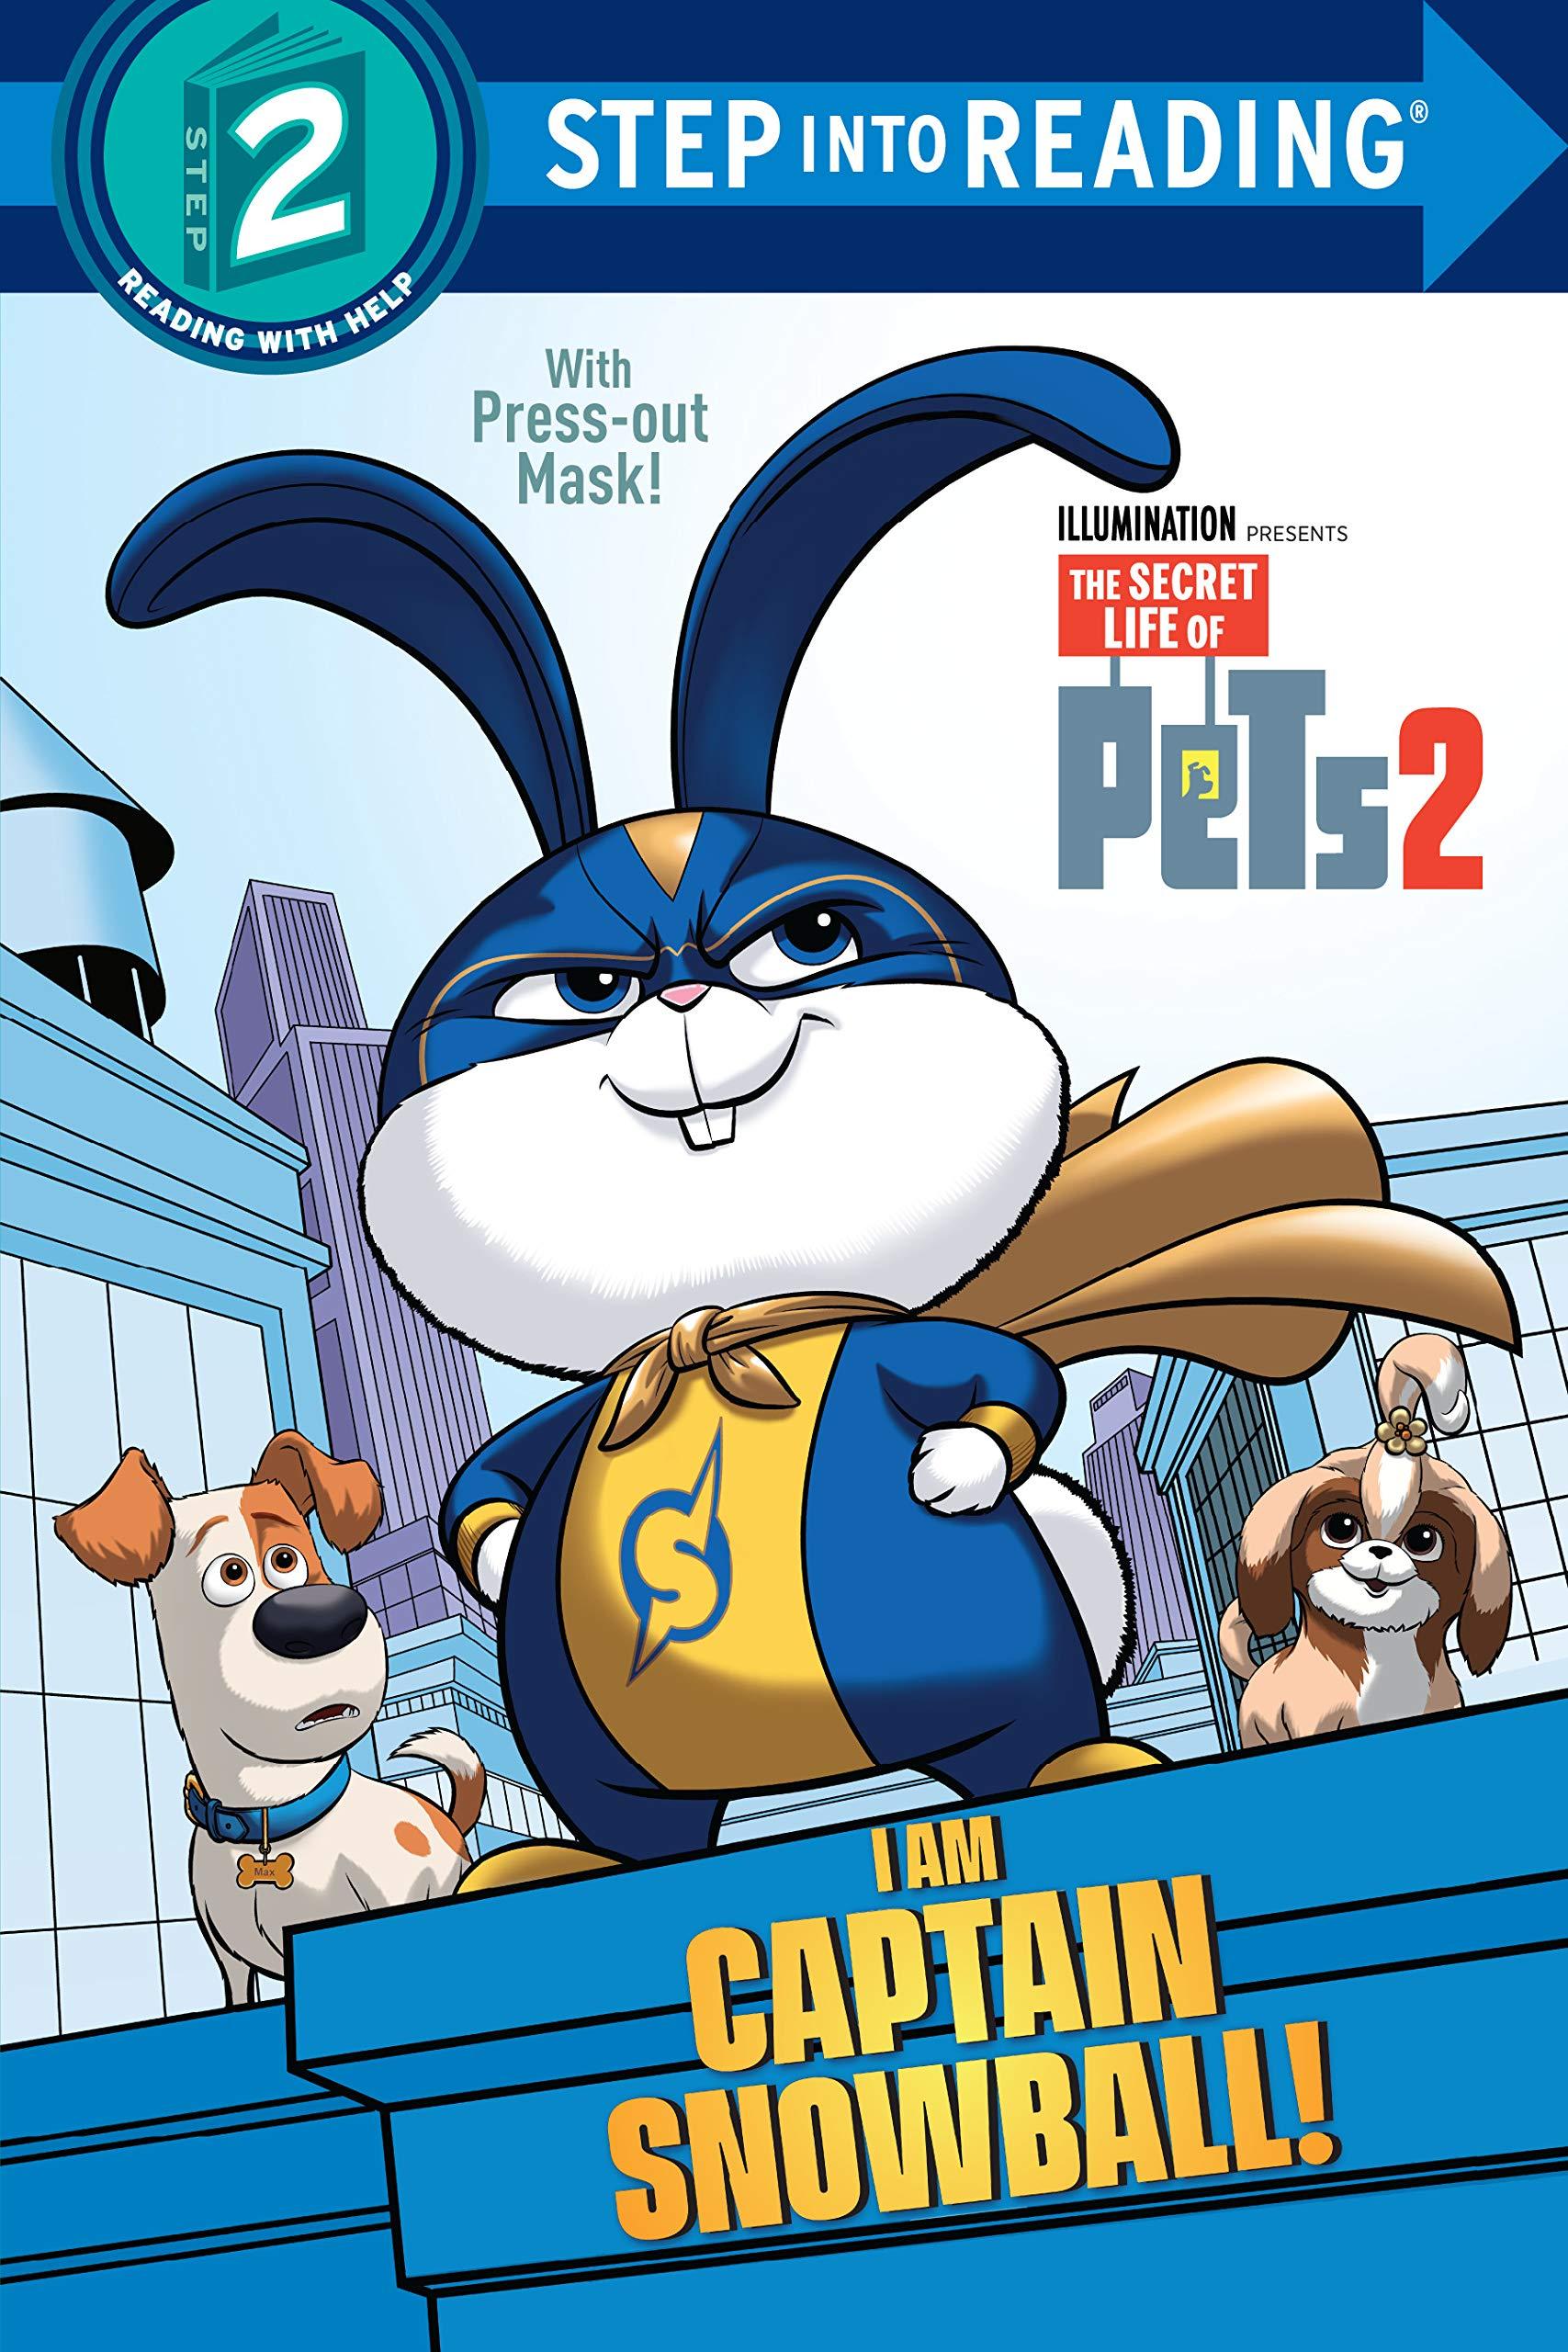 Amazon Com I Am Captain Snowball The Secret Life Of Pets 2 Step Into Reading 9781984849823 Shealy Dennis R Borkowski Michael Books